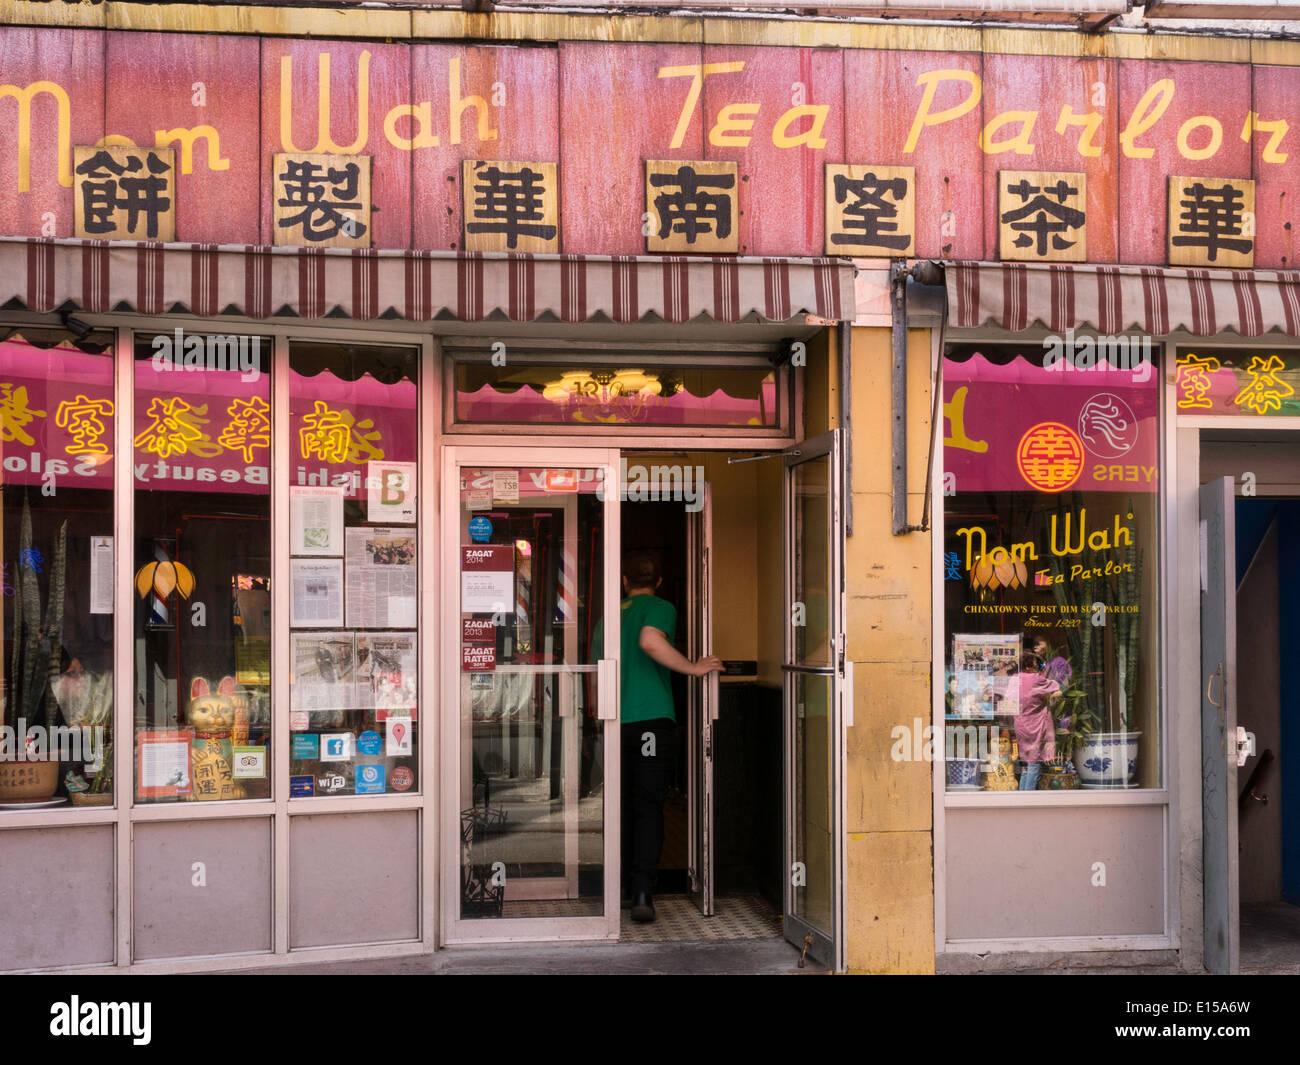 Nom Wah Tea And Dim Sum Parlor Restaurant Facade Chinatown